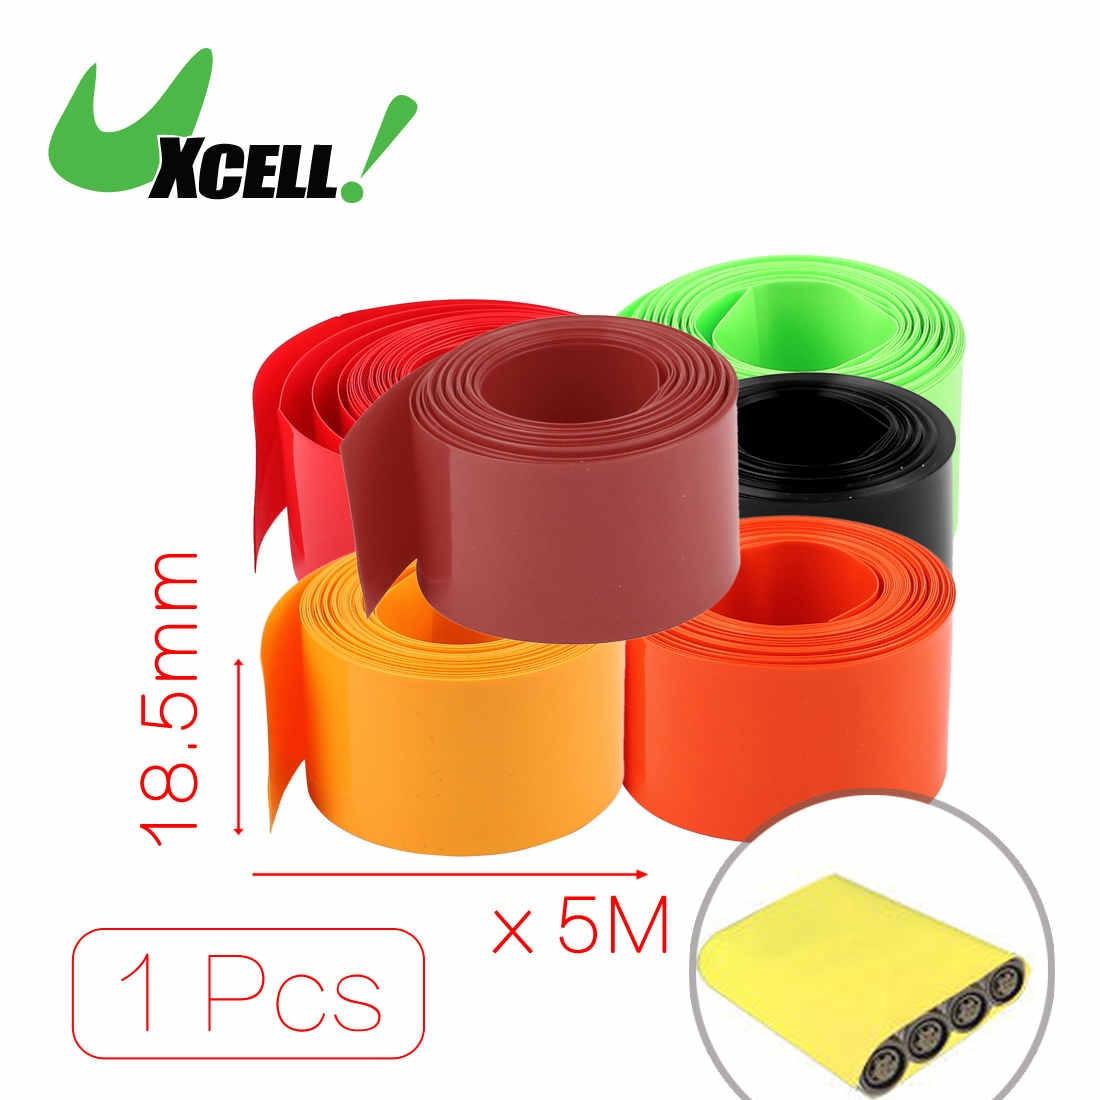 Uxcell 18.5Mm Diameter 5M Length Pvc Heat Shrink Tube Tubing Battery Wrap Clear .blackcleargreenorangeredwhite